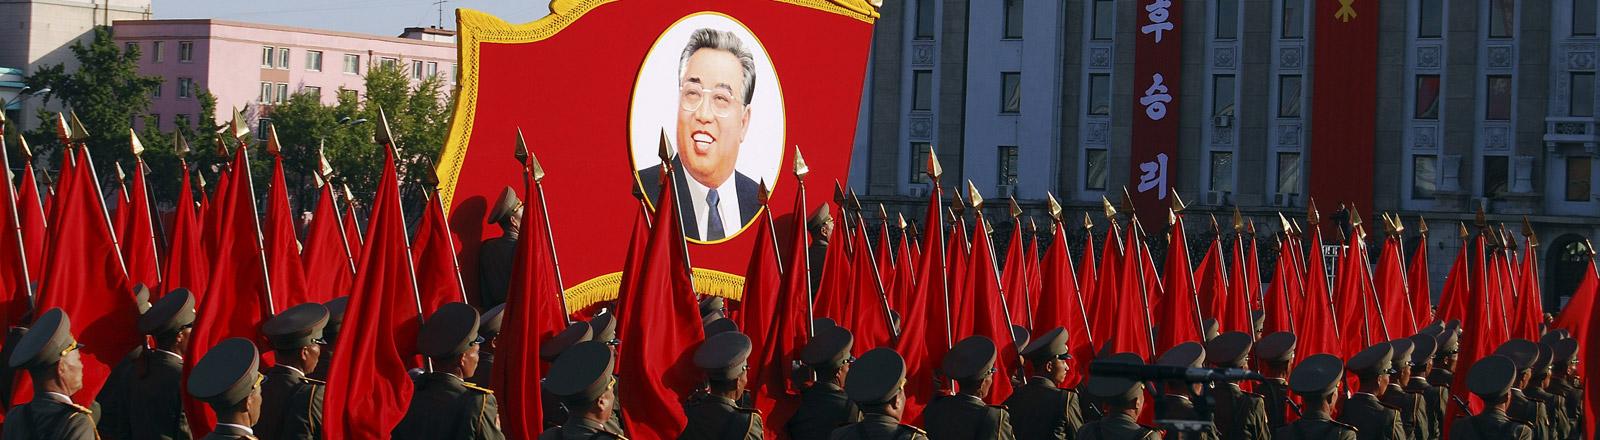 Militärparade in Nordkorea